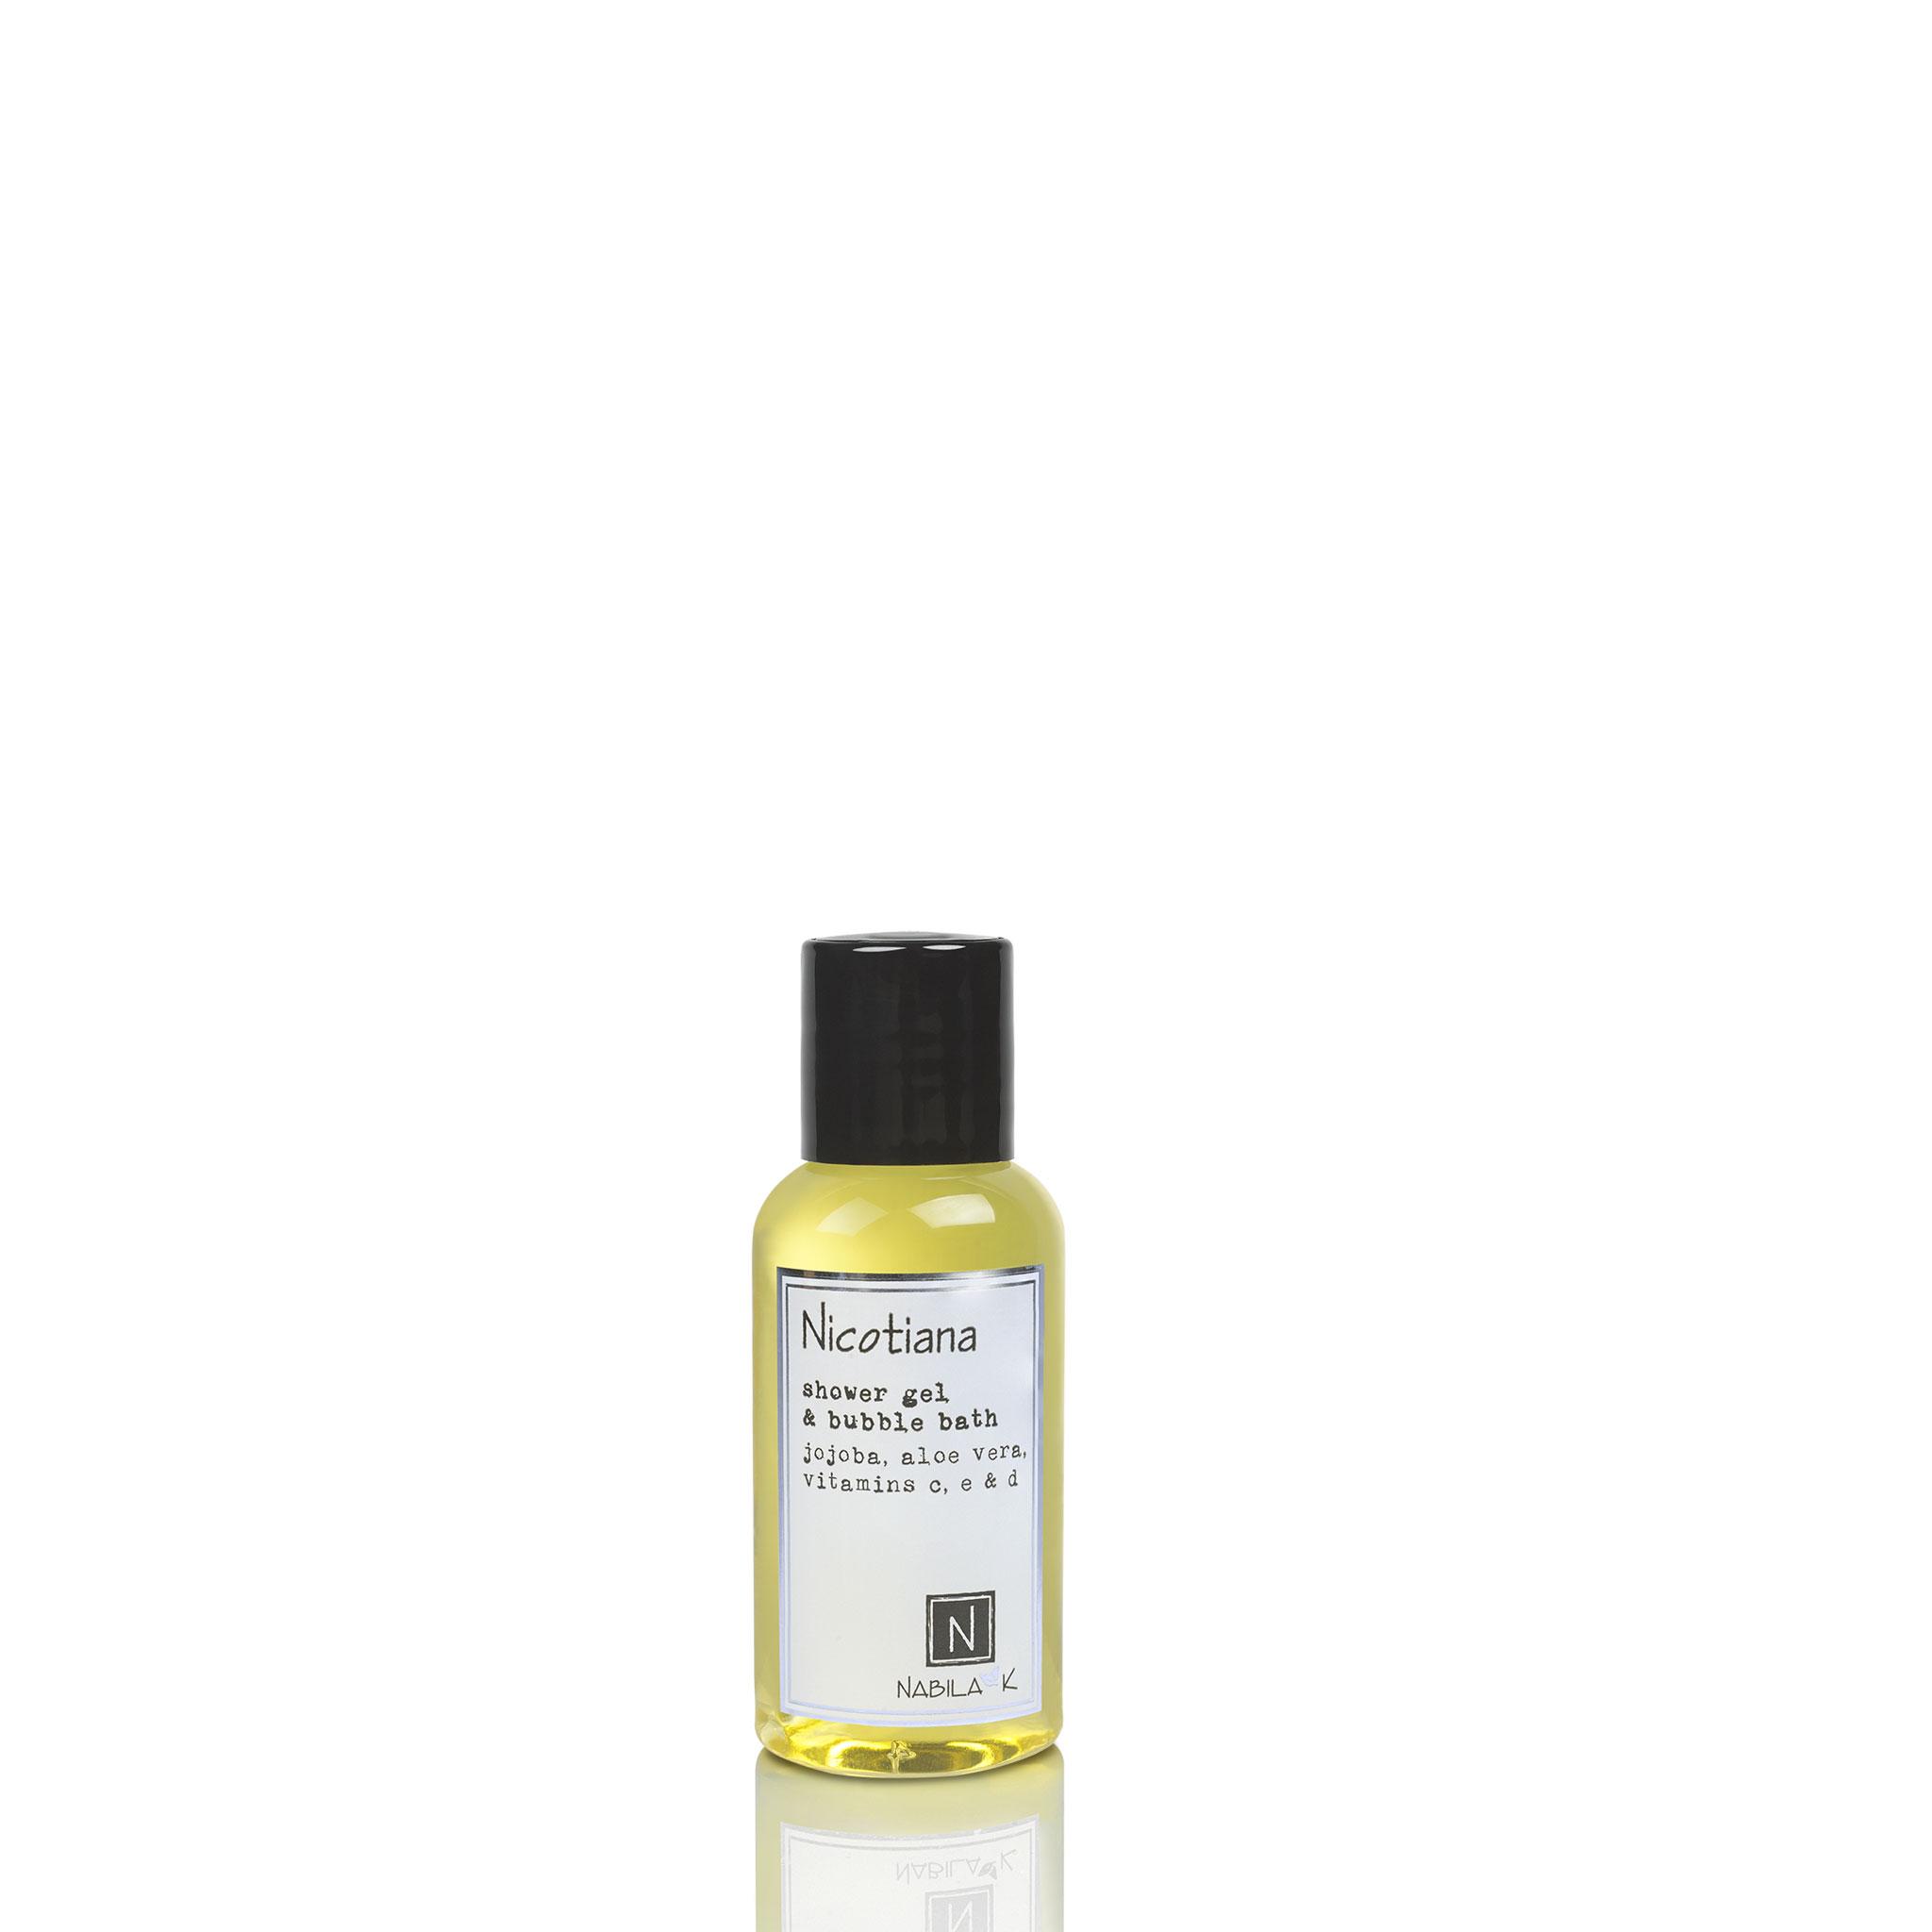 One Travel Size Version of Nabila K's Nicotiana Shower Gel and Bubble Bath Jojoba, Aloe Vera, Vitamins C, E, & D